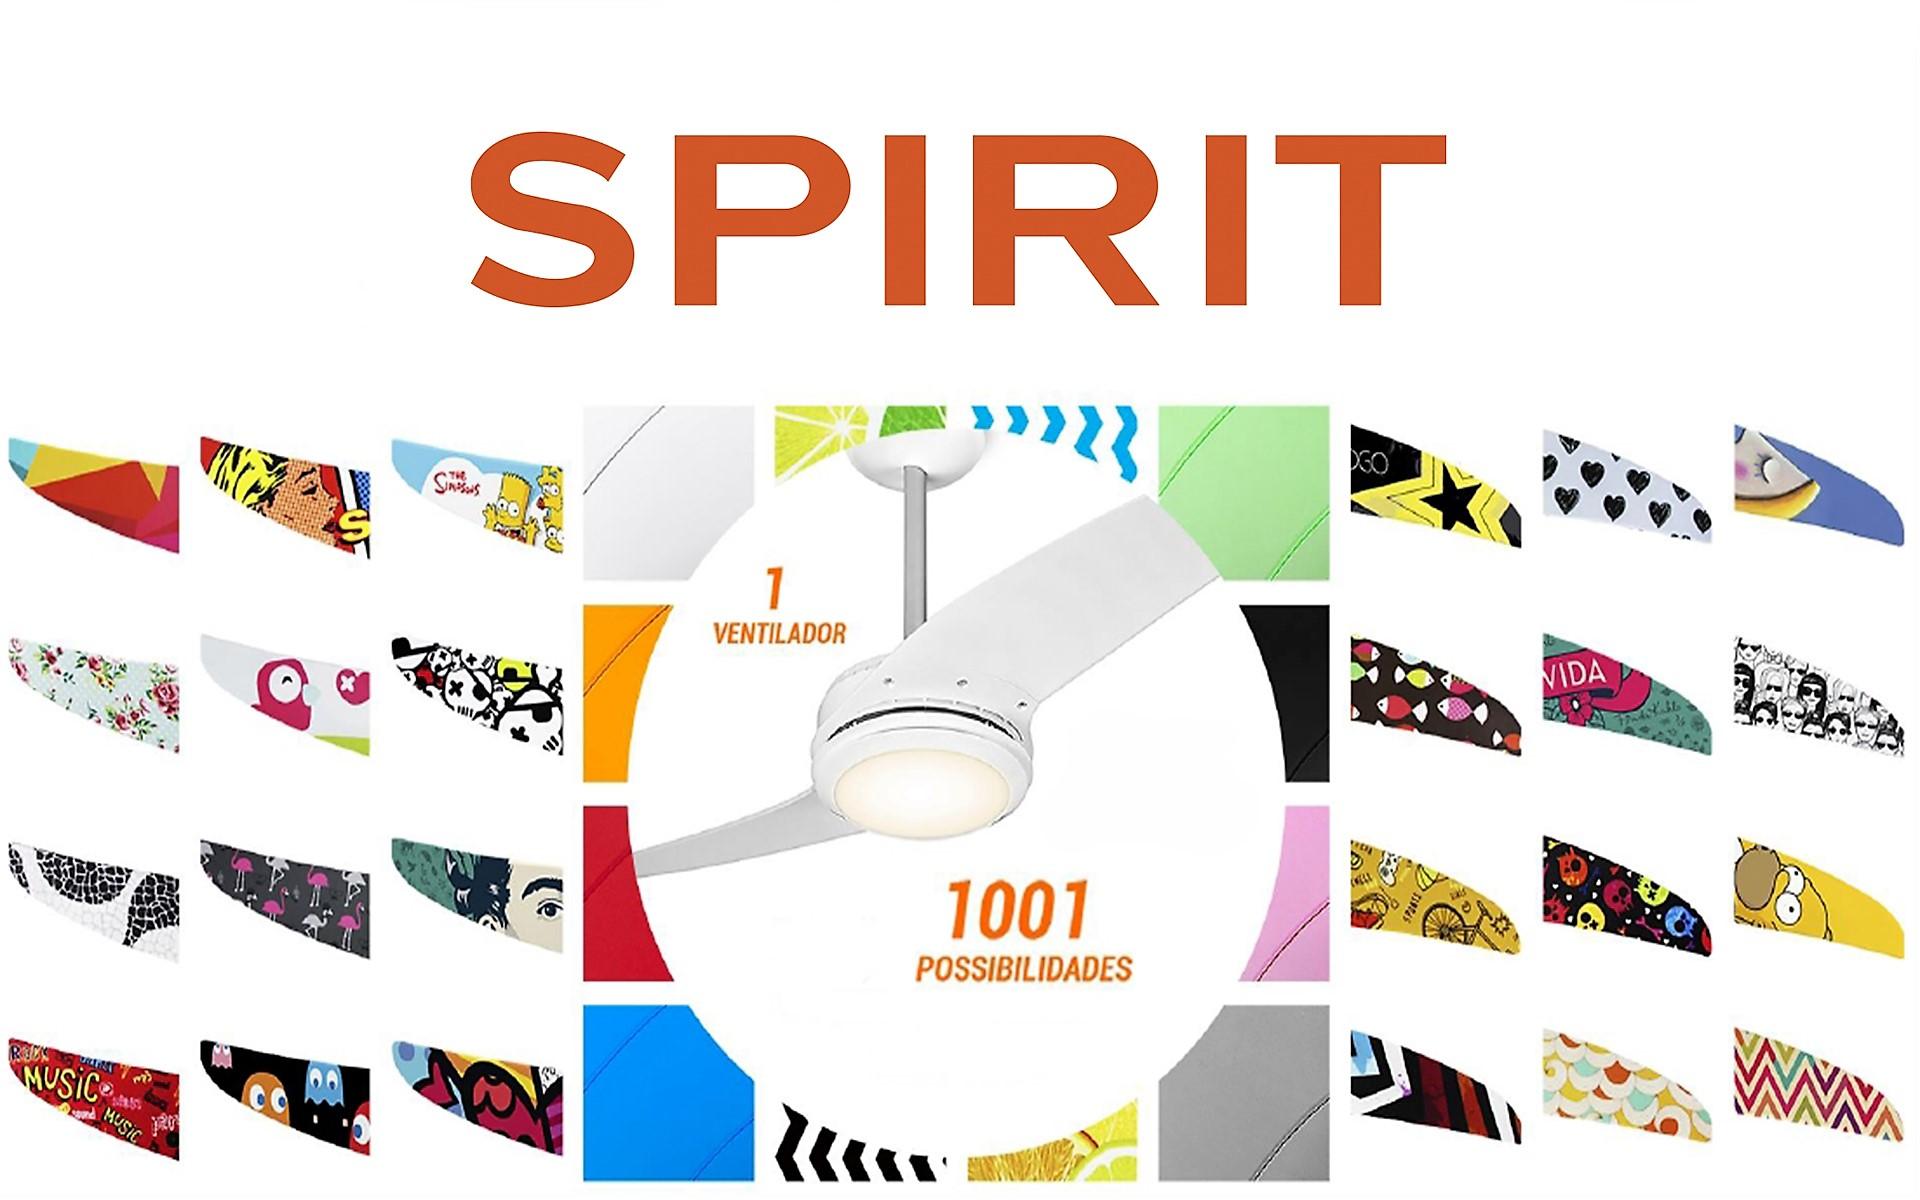 ventilador de teto Spirit - Blog Myspirit - capa blog - trocar as pás do ventilador de teto